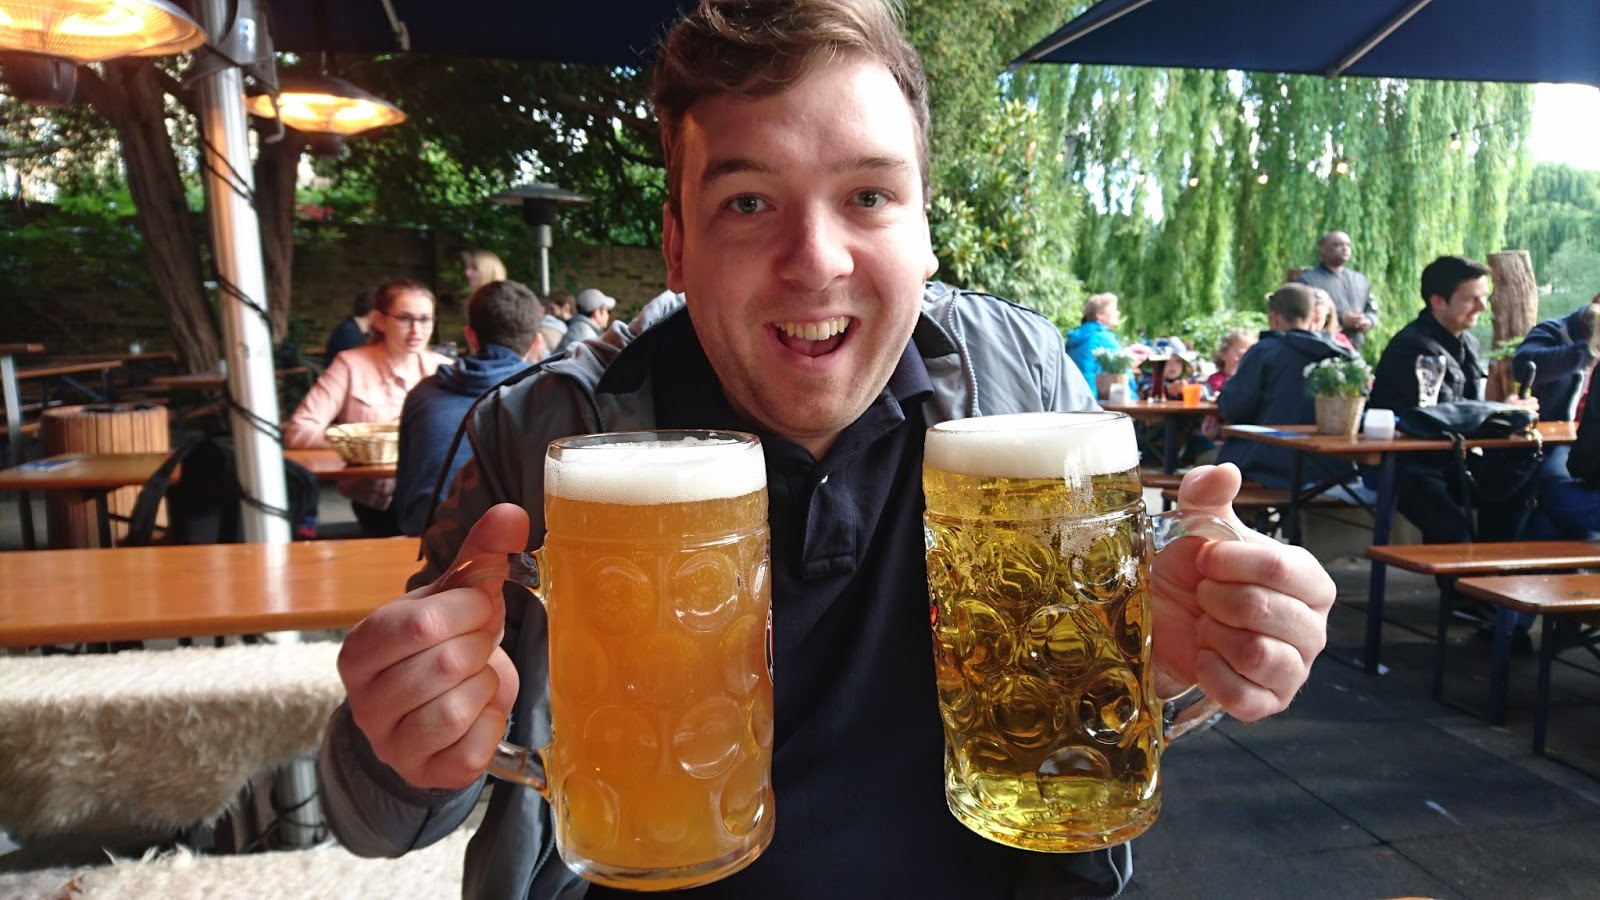 Man holding drinks